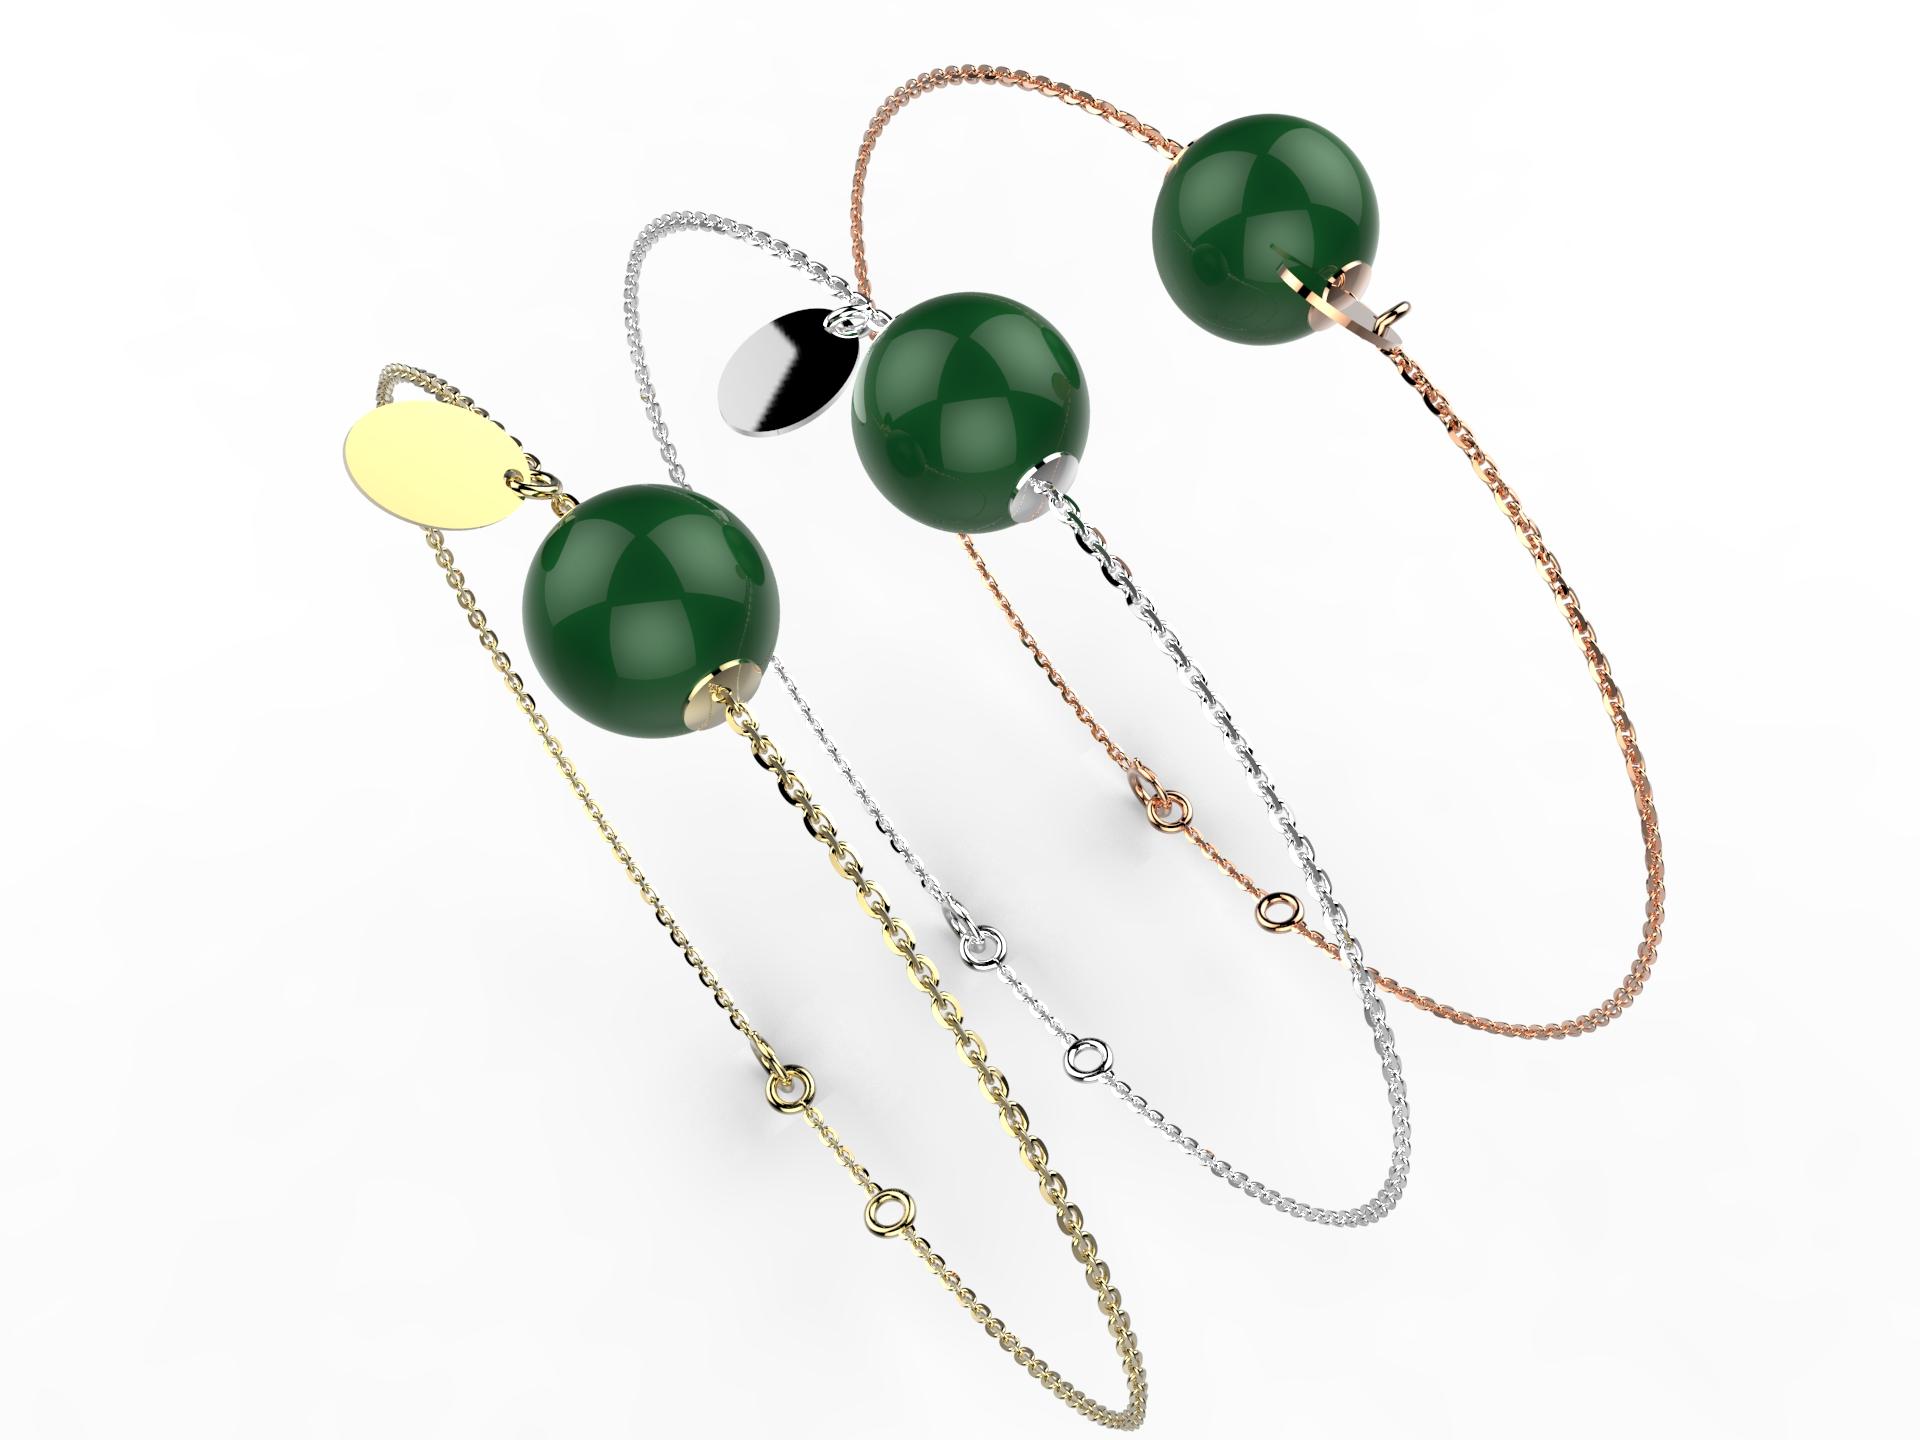 Bracelet or perle agate verte 305 €